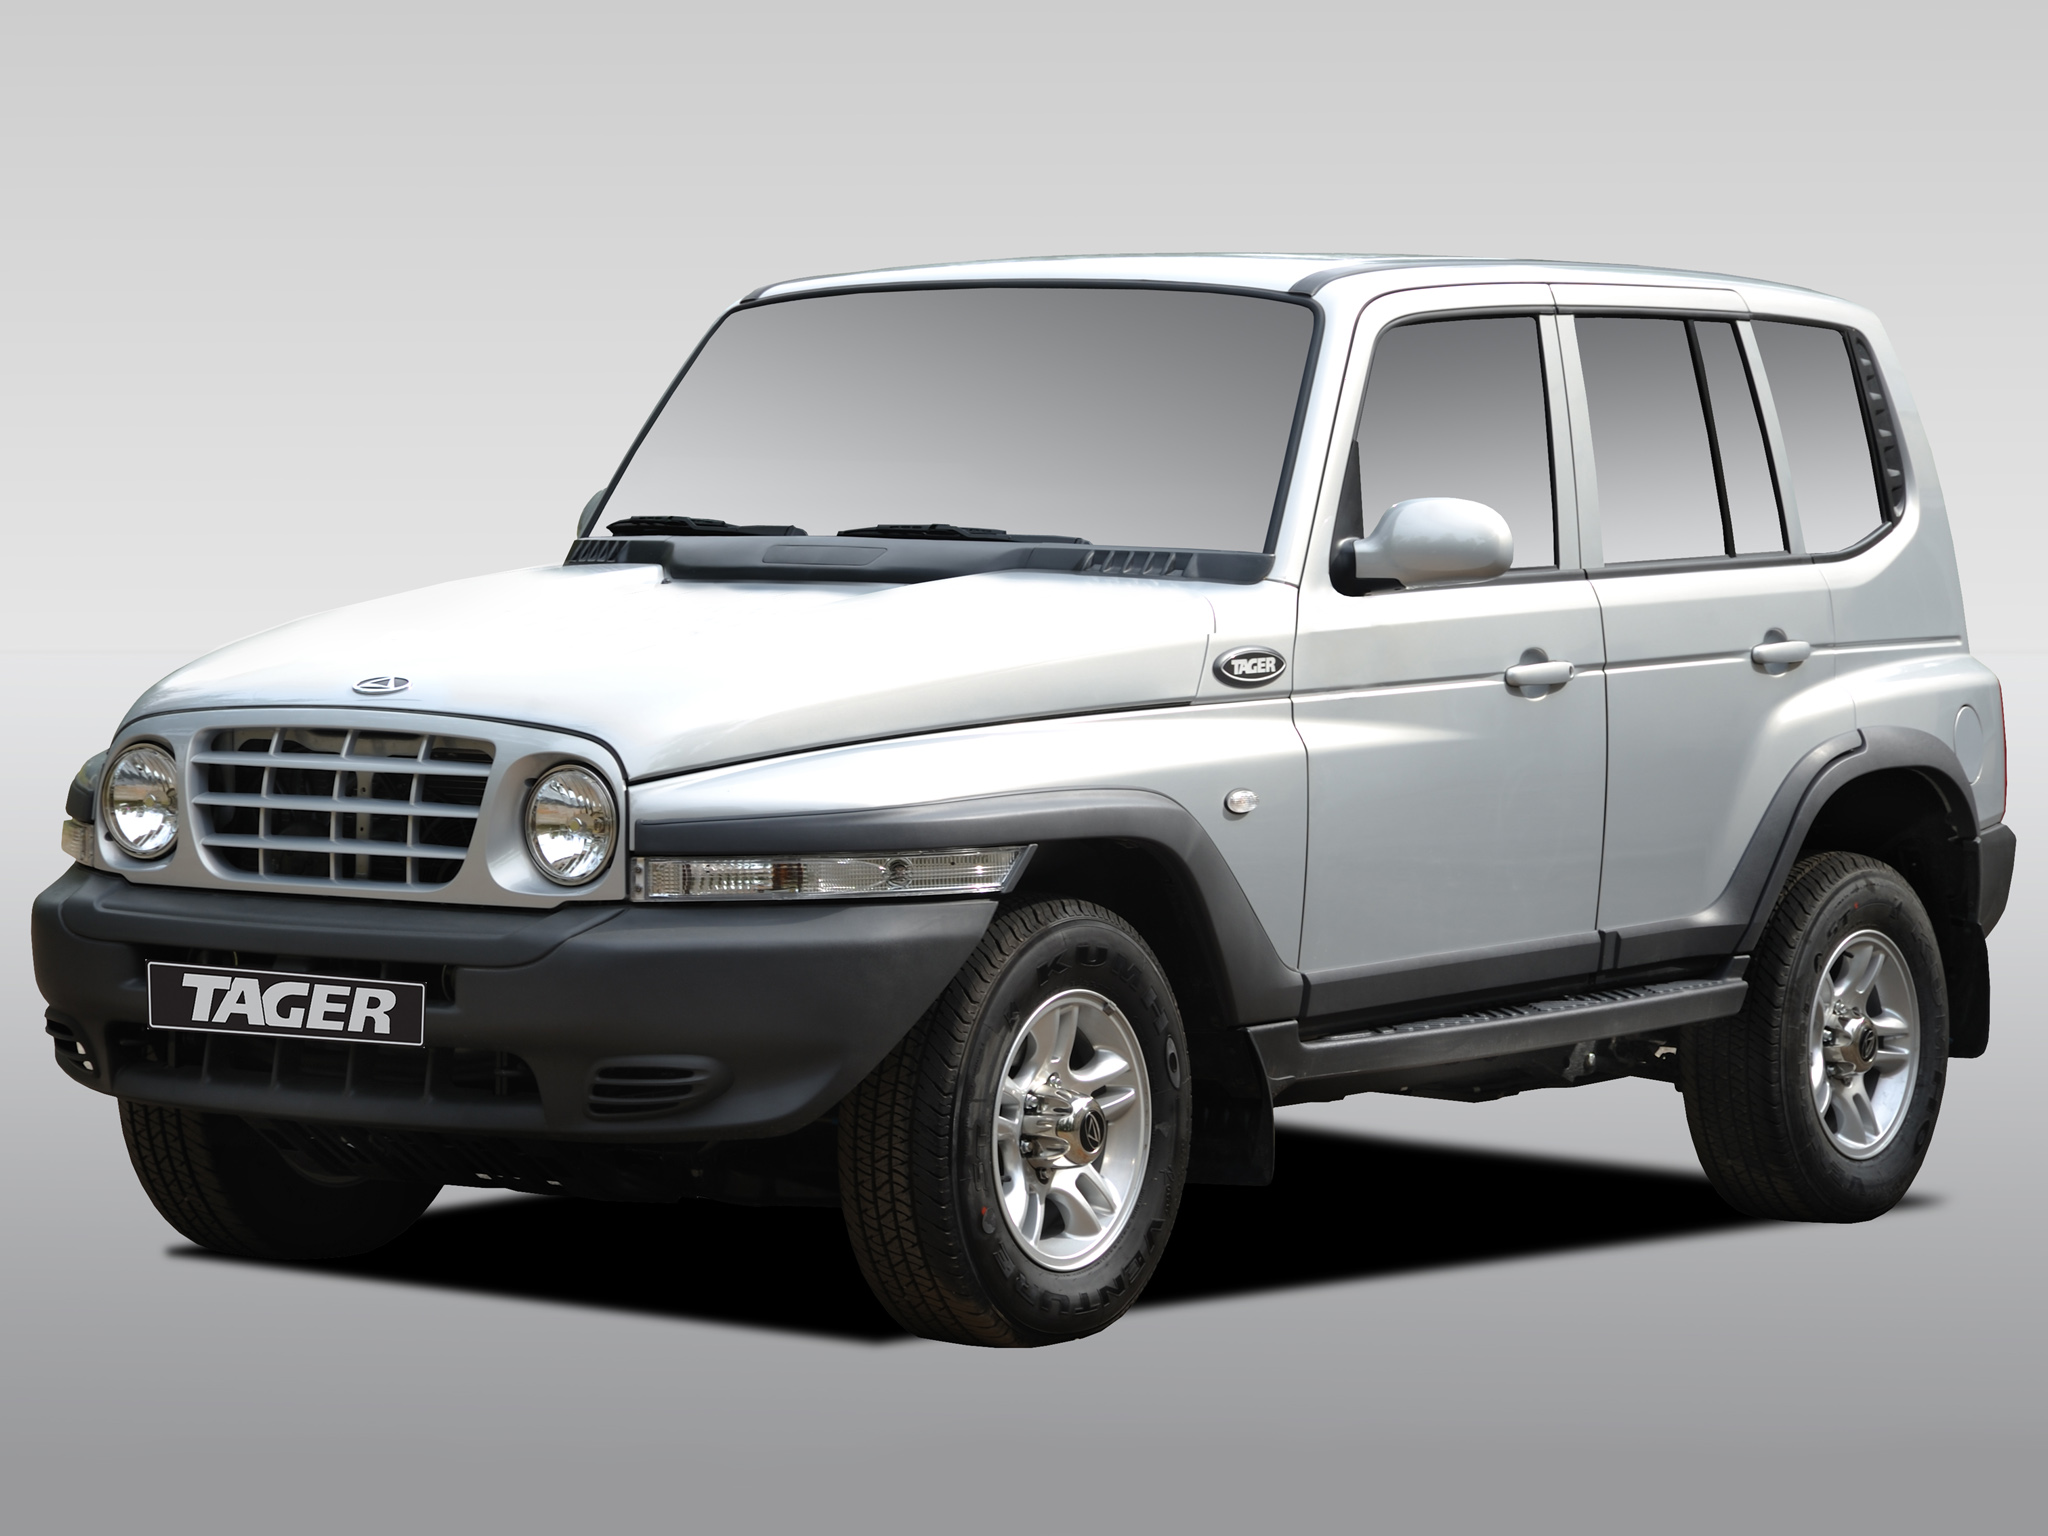 Vortex Tingo I 2011 - 2012 SUV 5 door #2